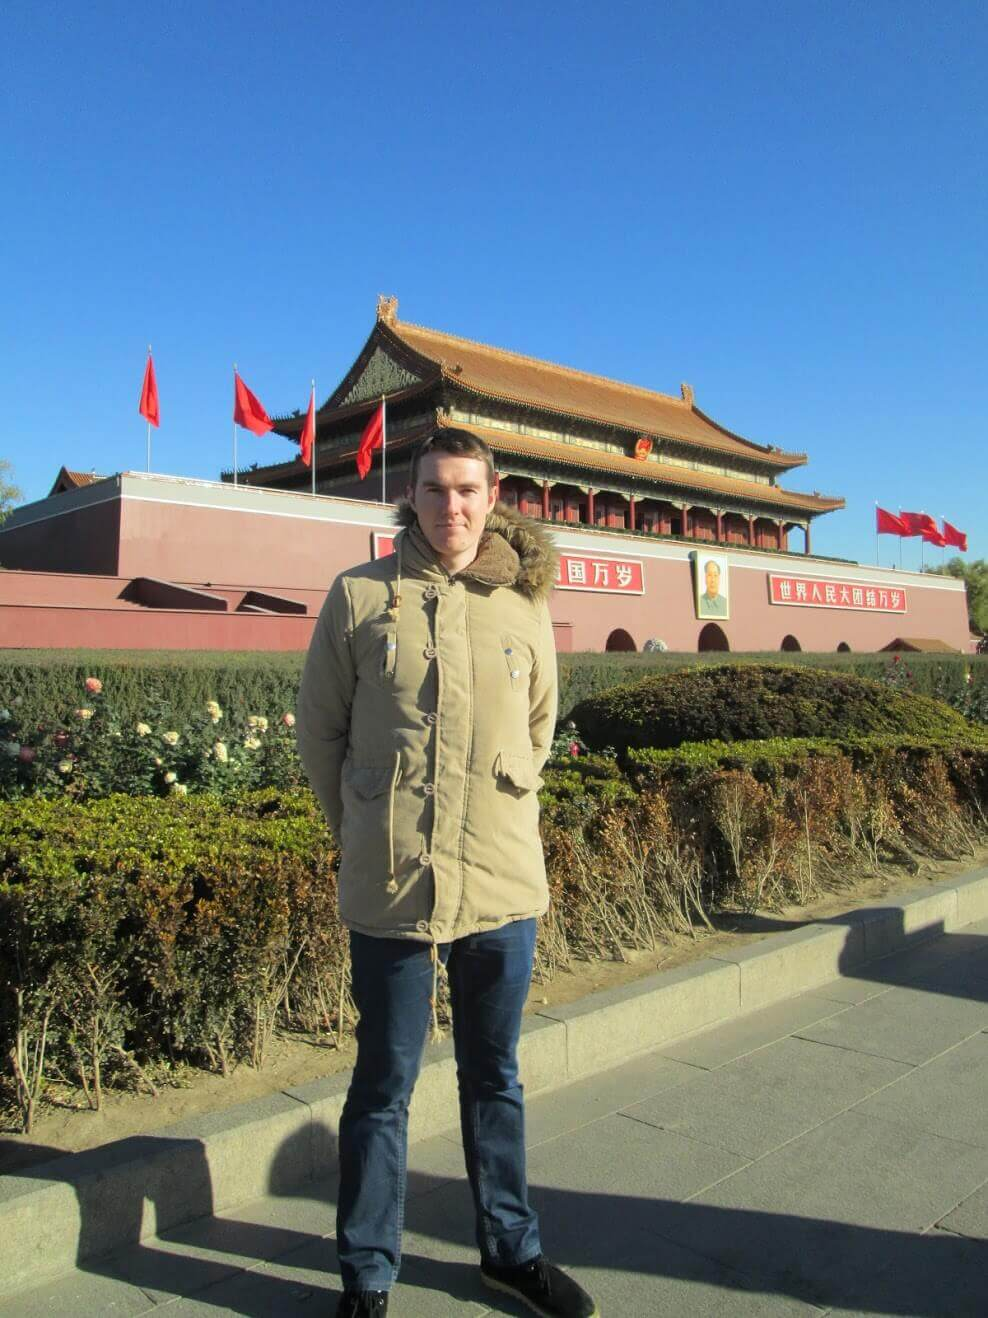 Neil Beijing